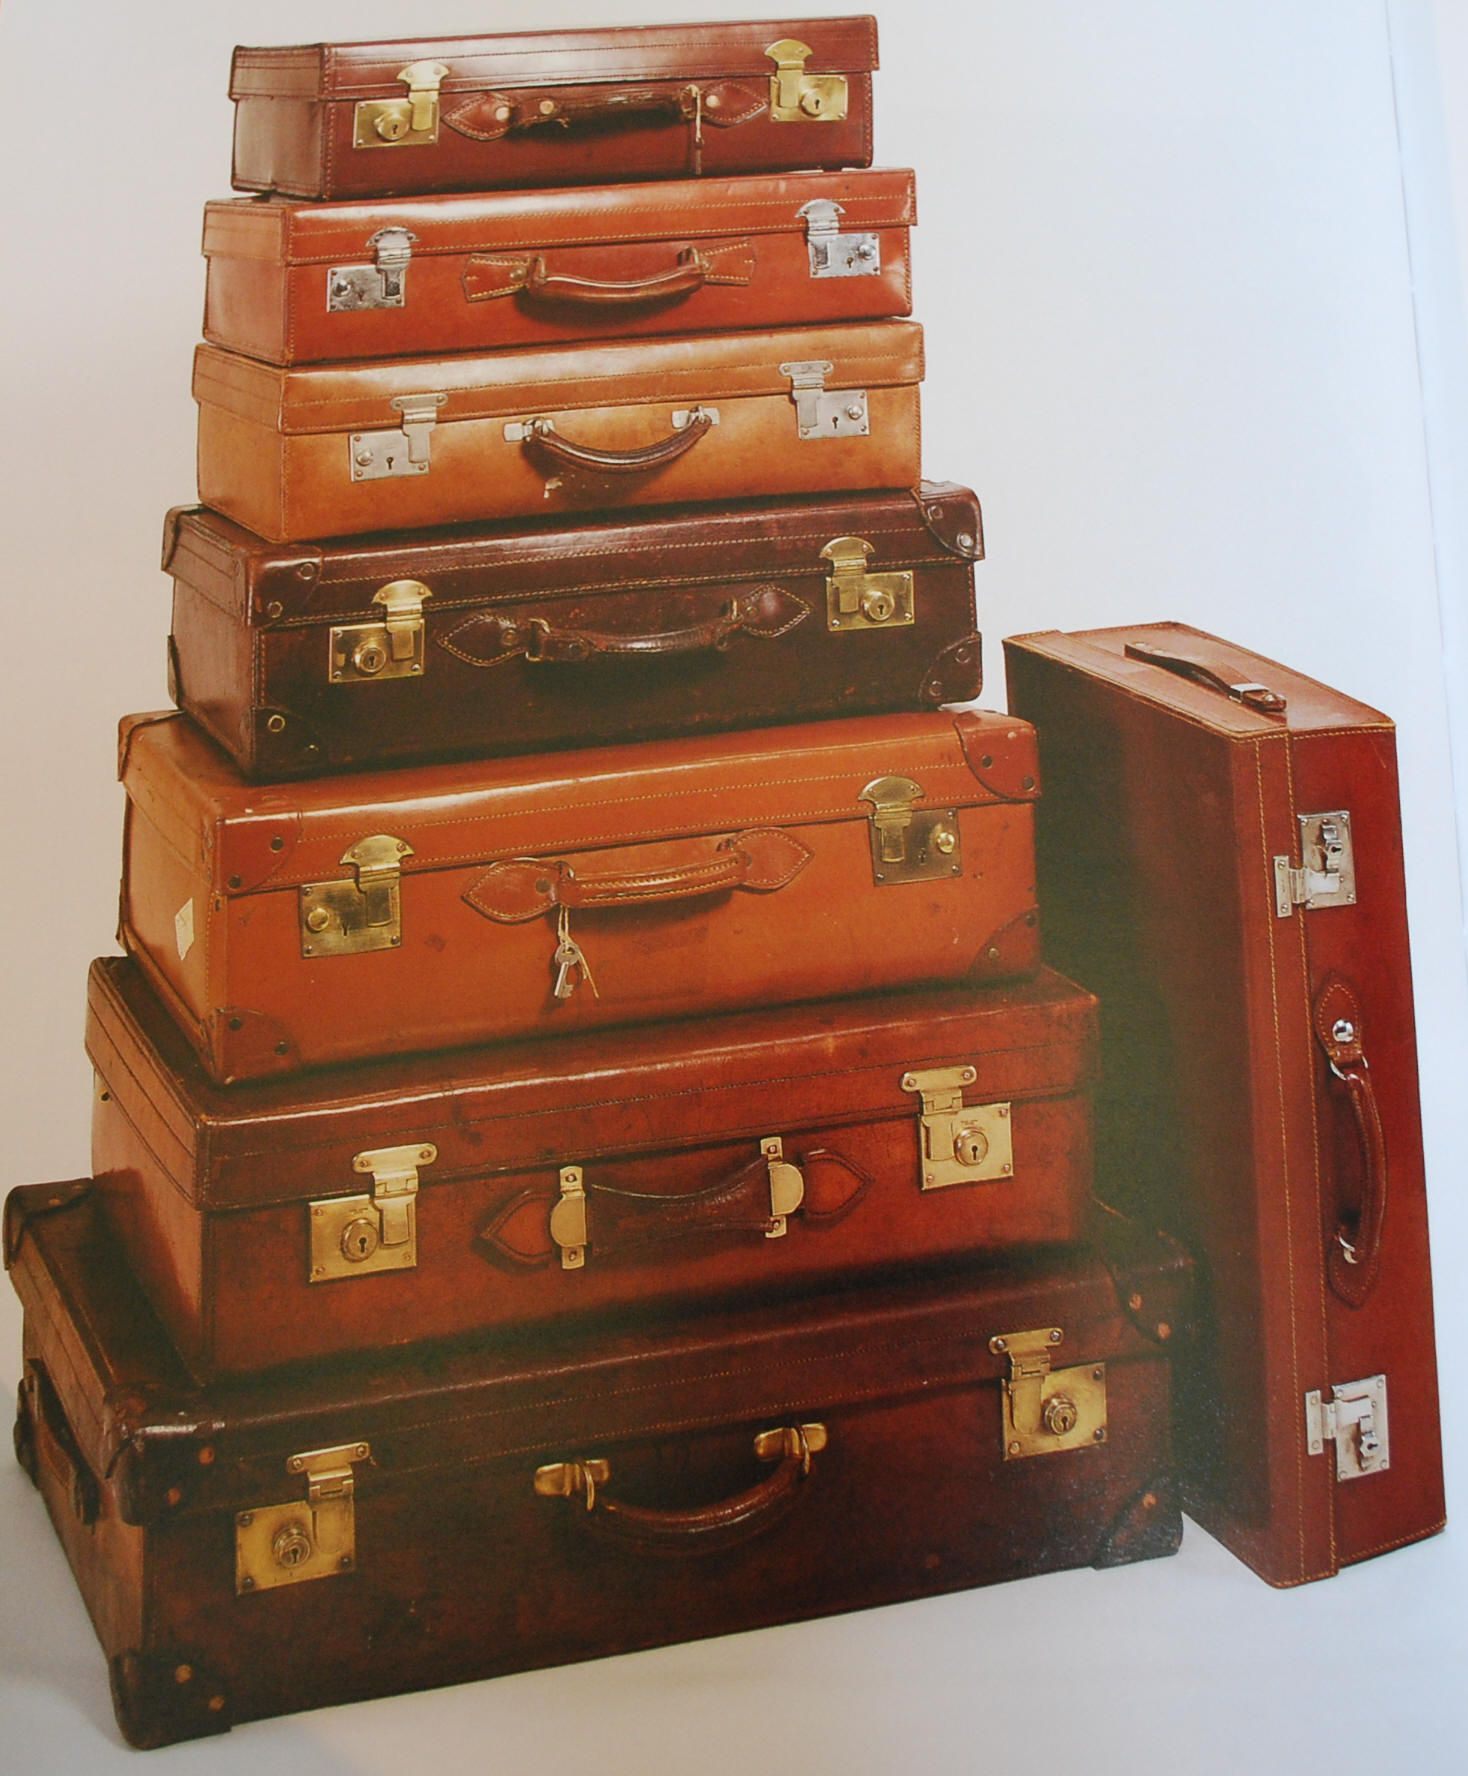 Vintage suitcases | Vintage | Pinterest | Vintage luggage ...